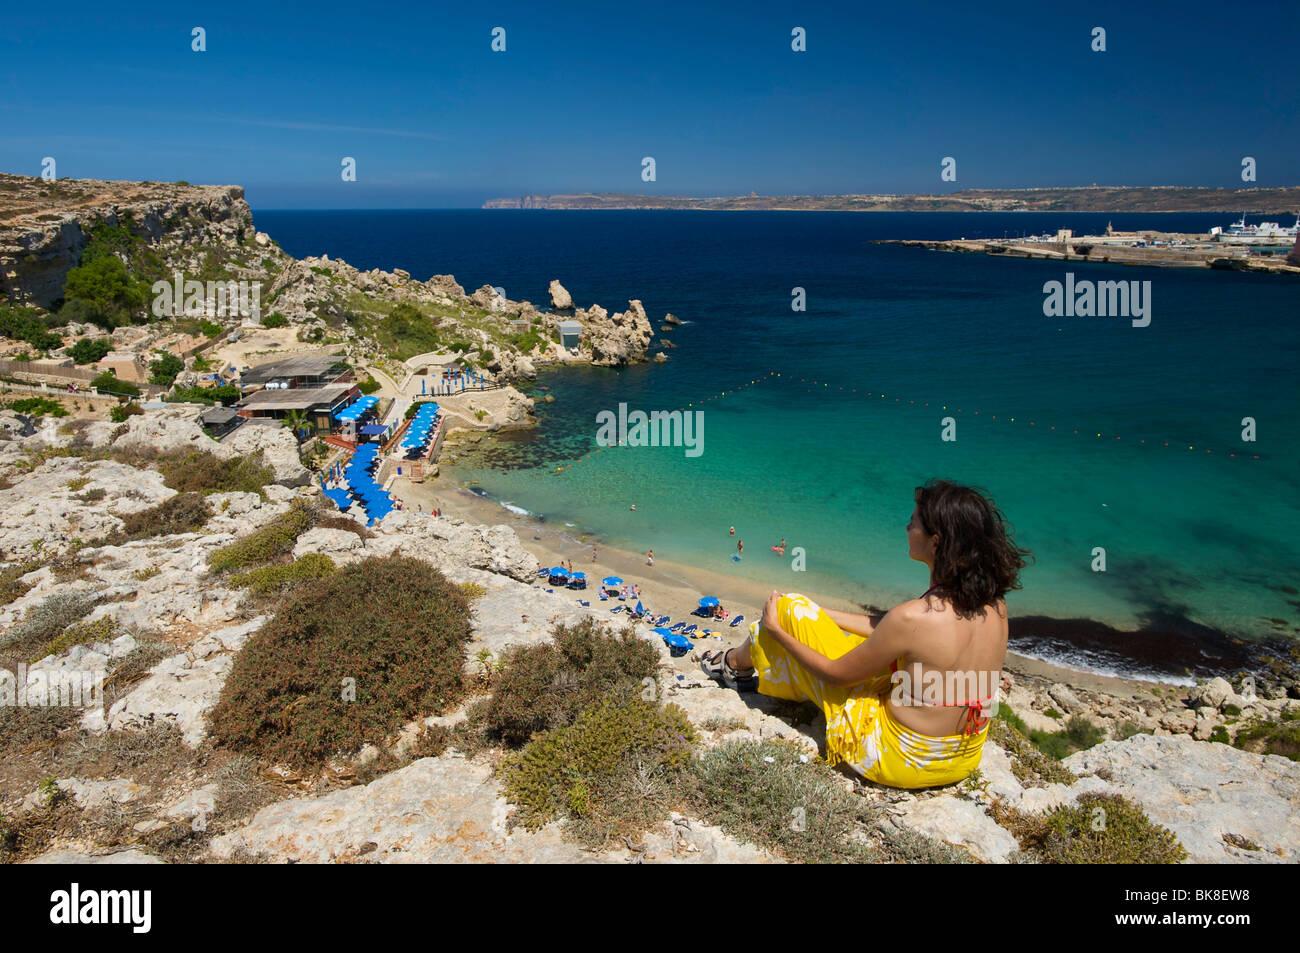 Woman looking on Paradise Bay in Cirkewwa, Malta, Europe - Stock Image